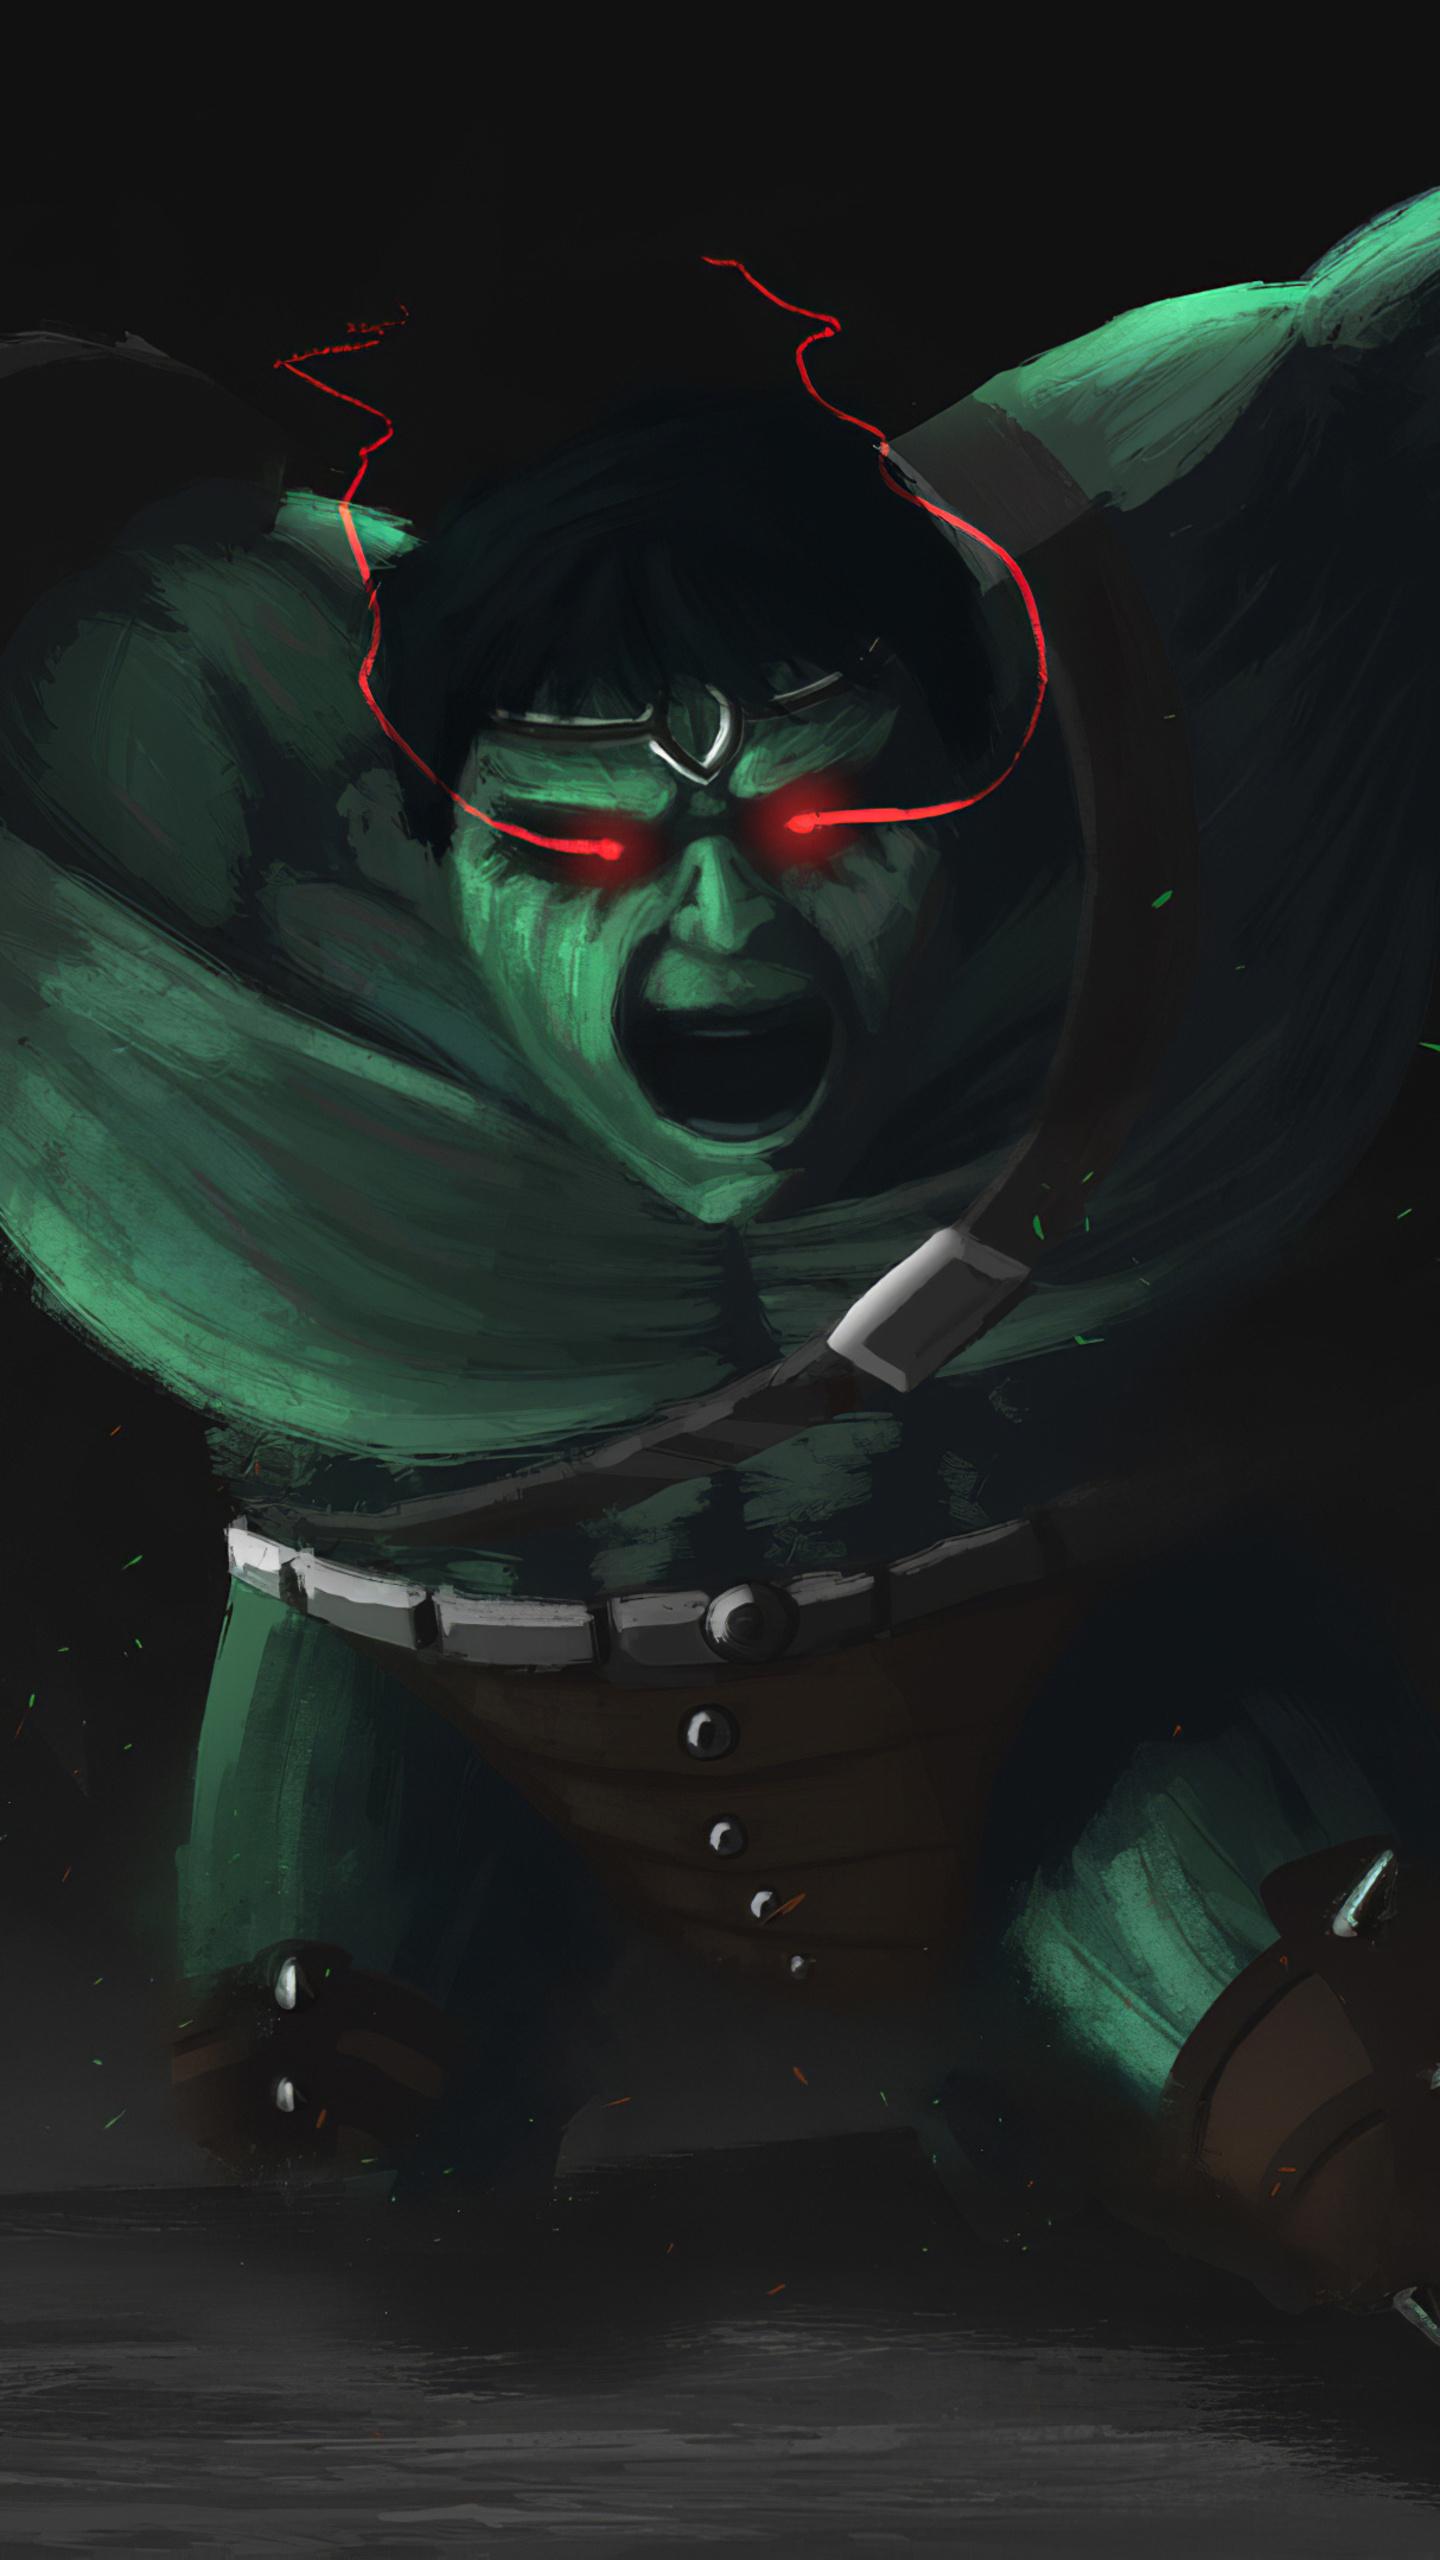 hulk-angry-4k-2l.jpg